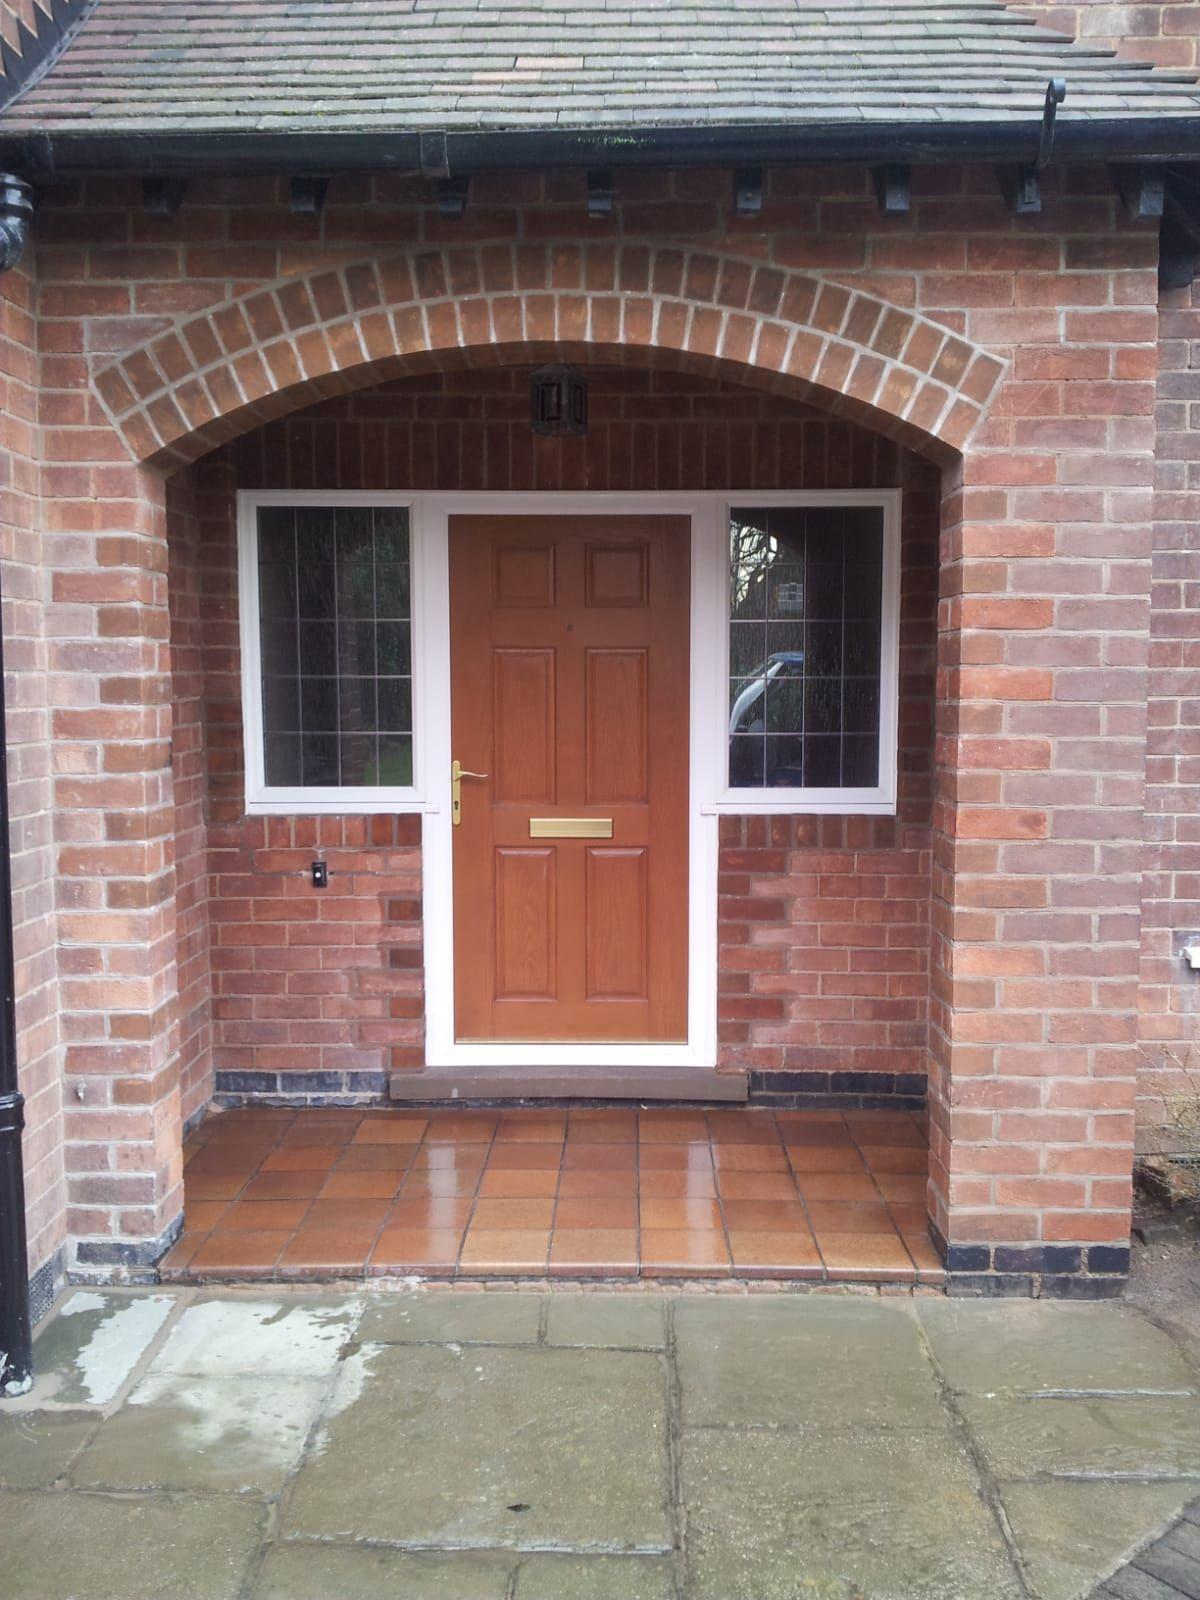 Porch restored